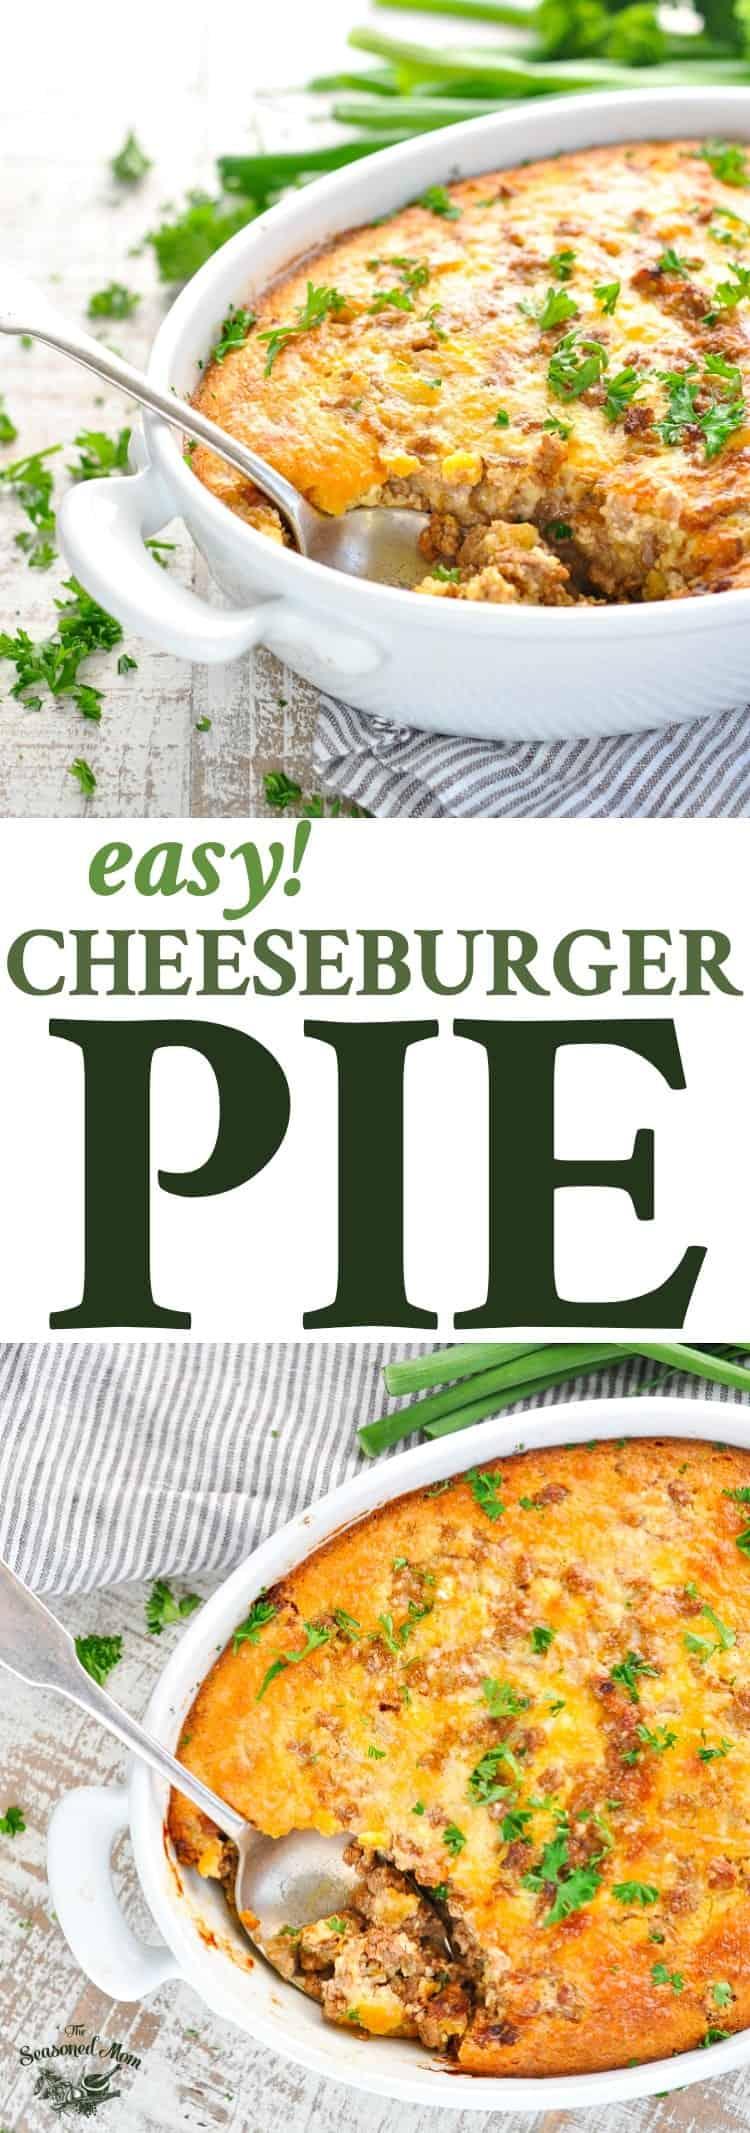 Long vertical image of Easy Cheeseburger Pie